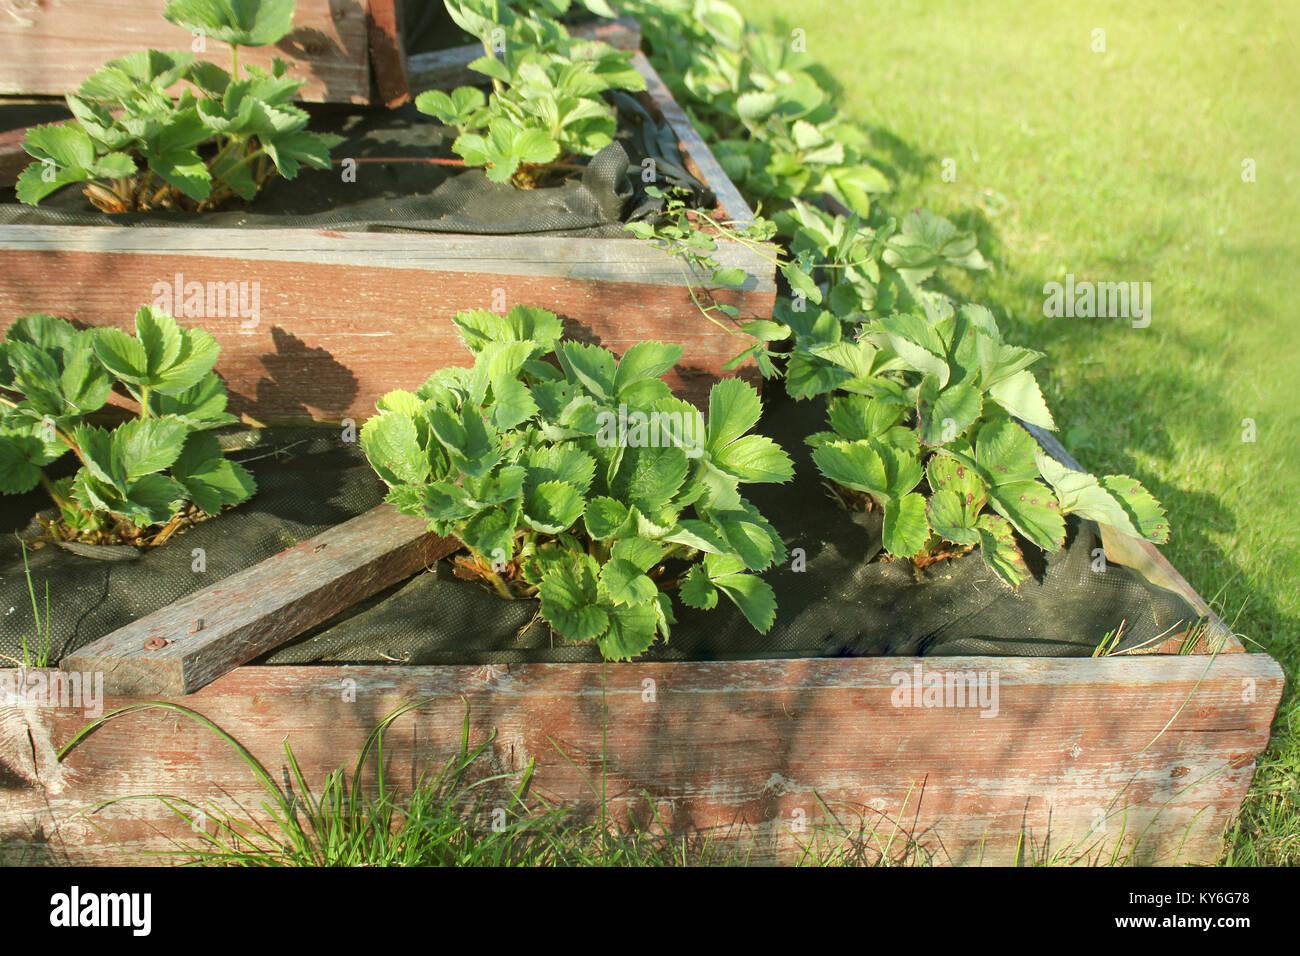 Erdbeeren wächst in angehobener Garten Bett. Pyramide angehoben Garten Stockbild